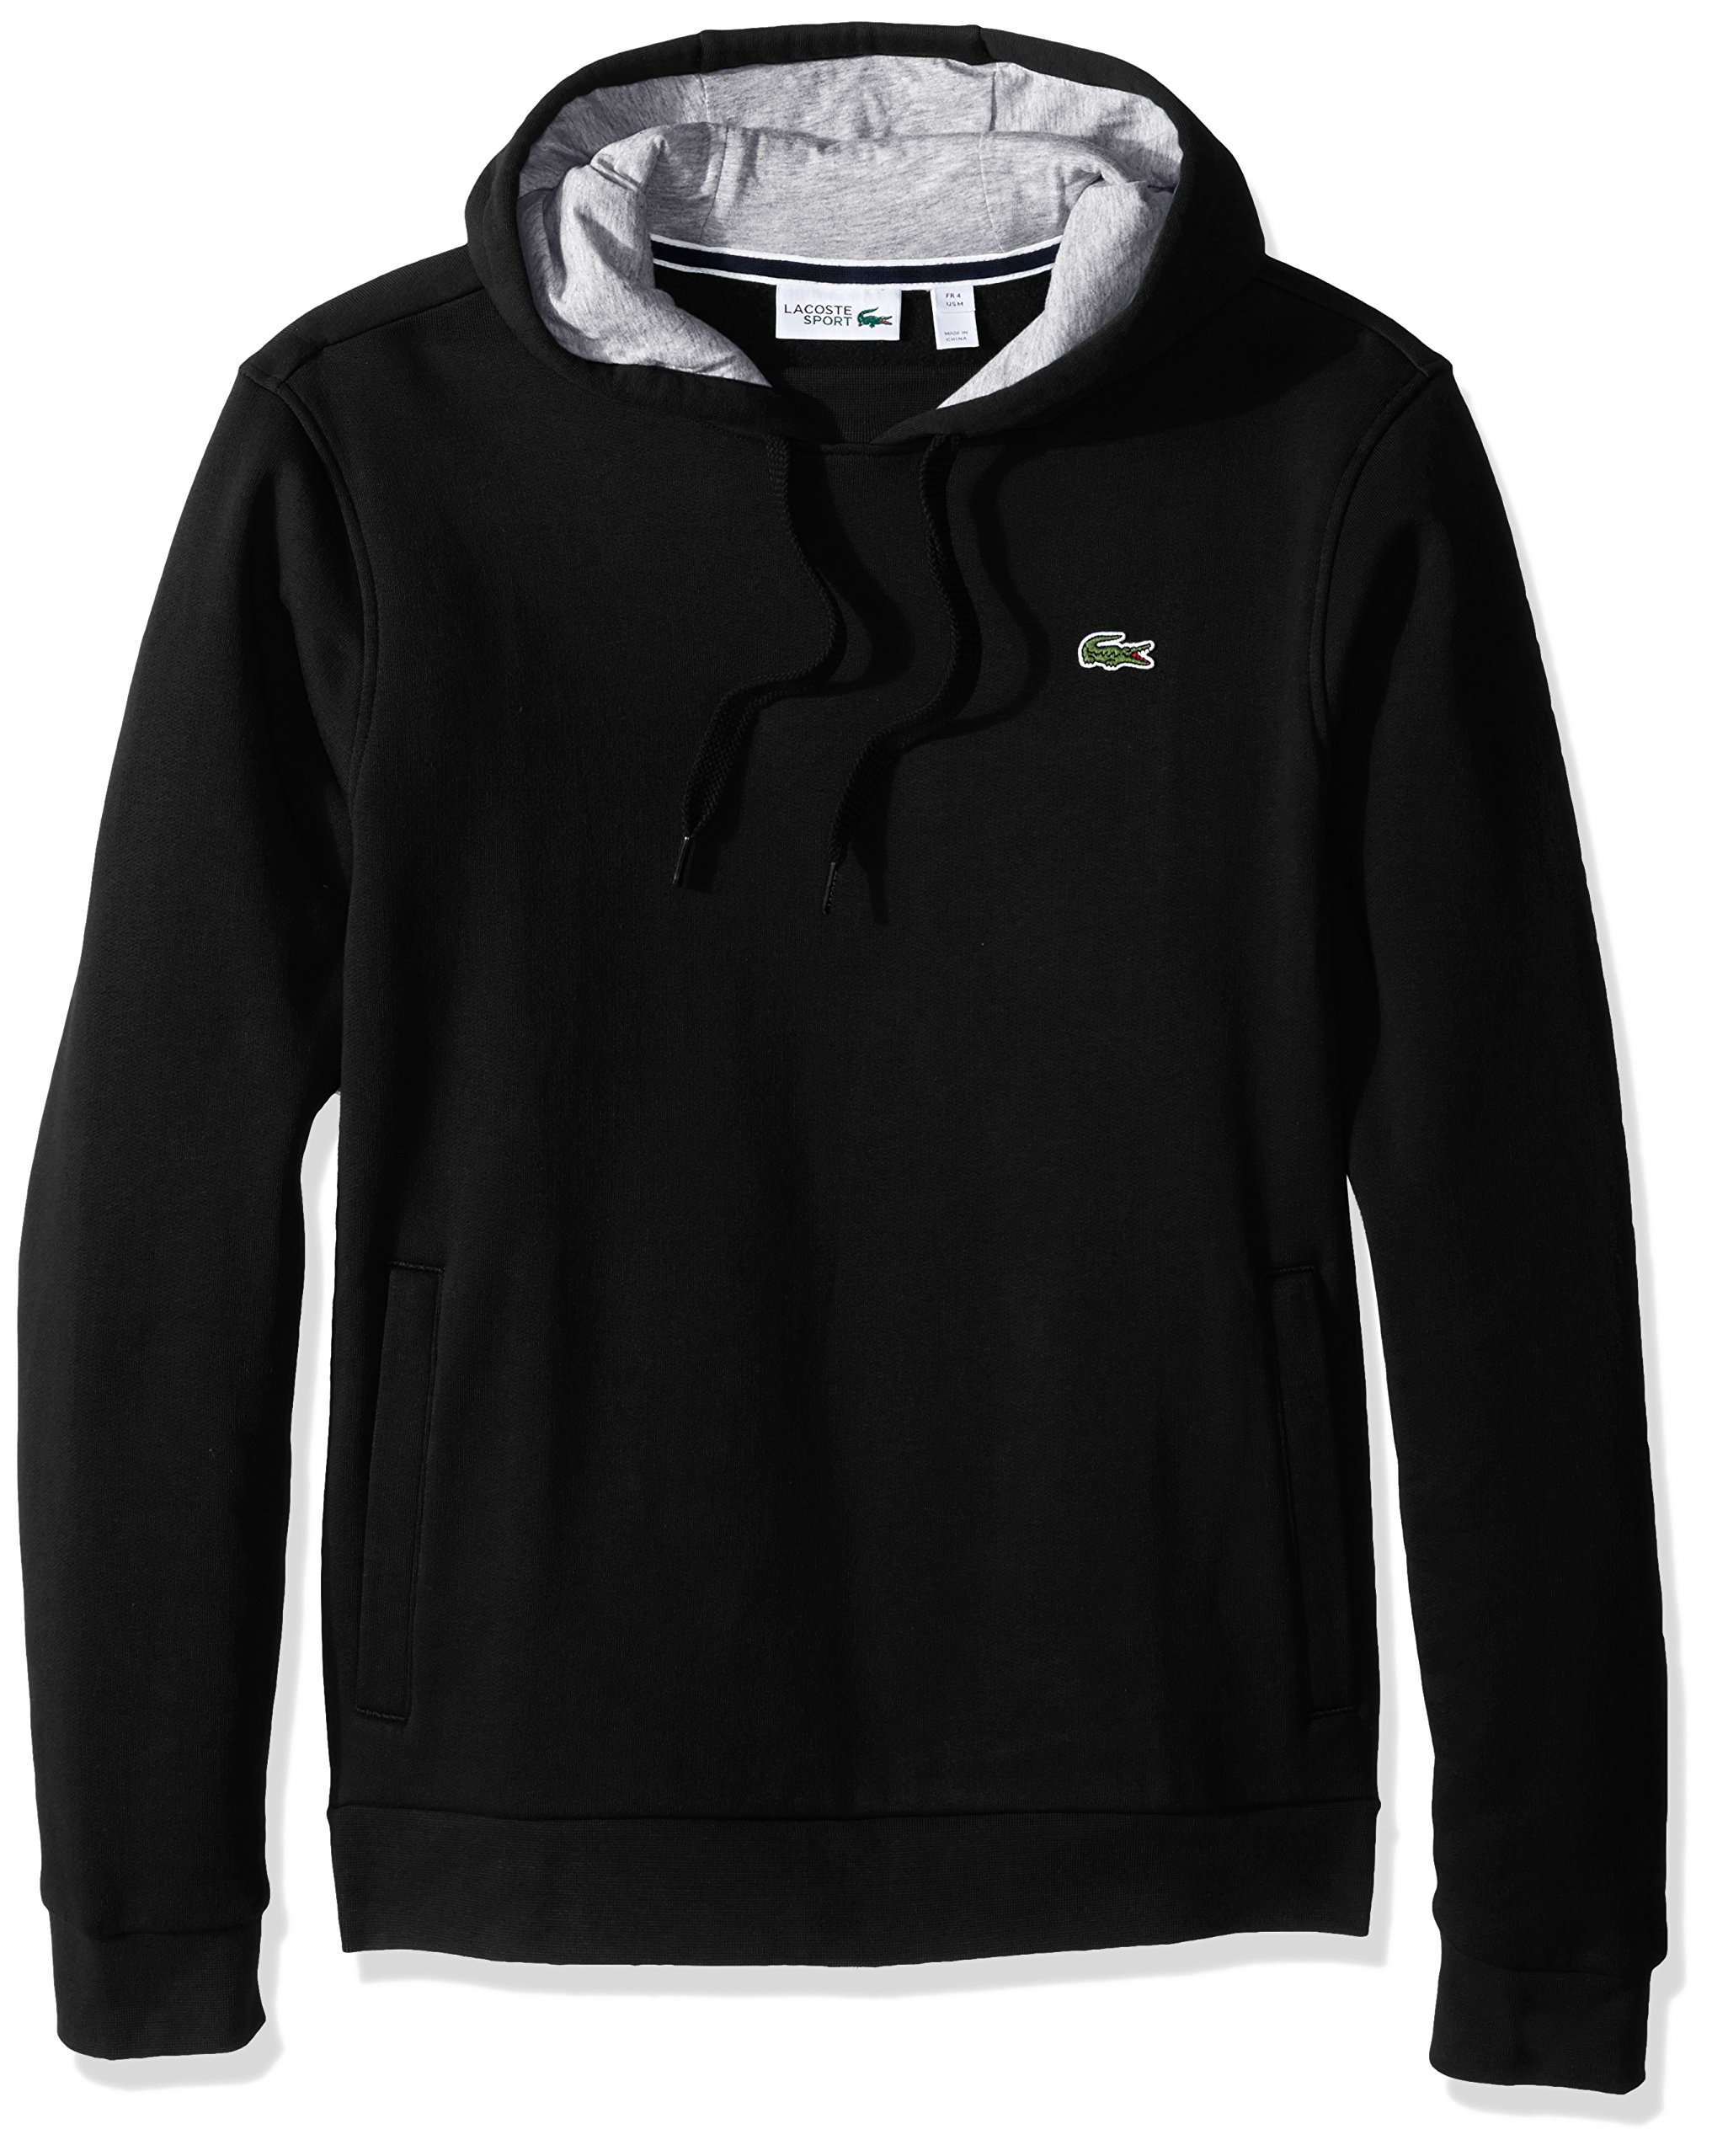 Lacoste Men's Sport Pull Over Hoodie Fleece Sweatshirt, SH2128, Black/Silver Chine, XXX-Large